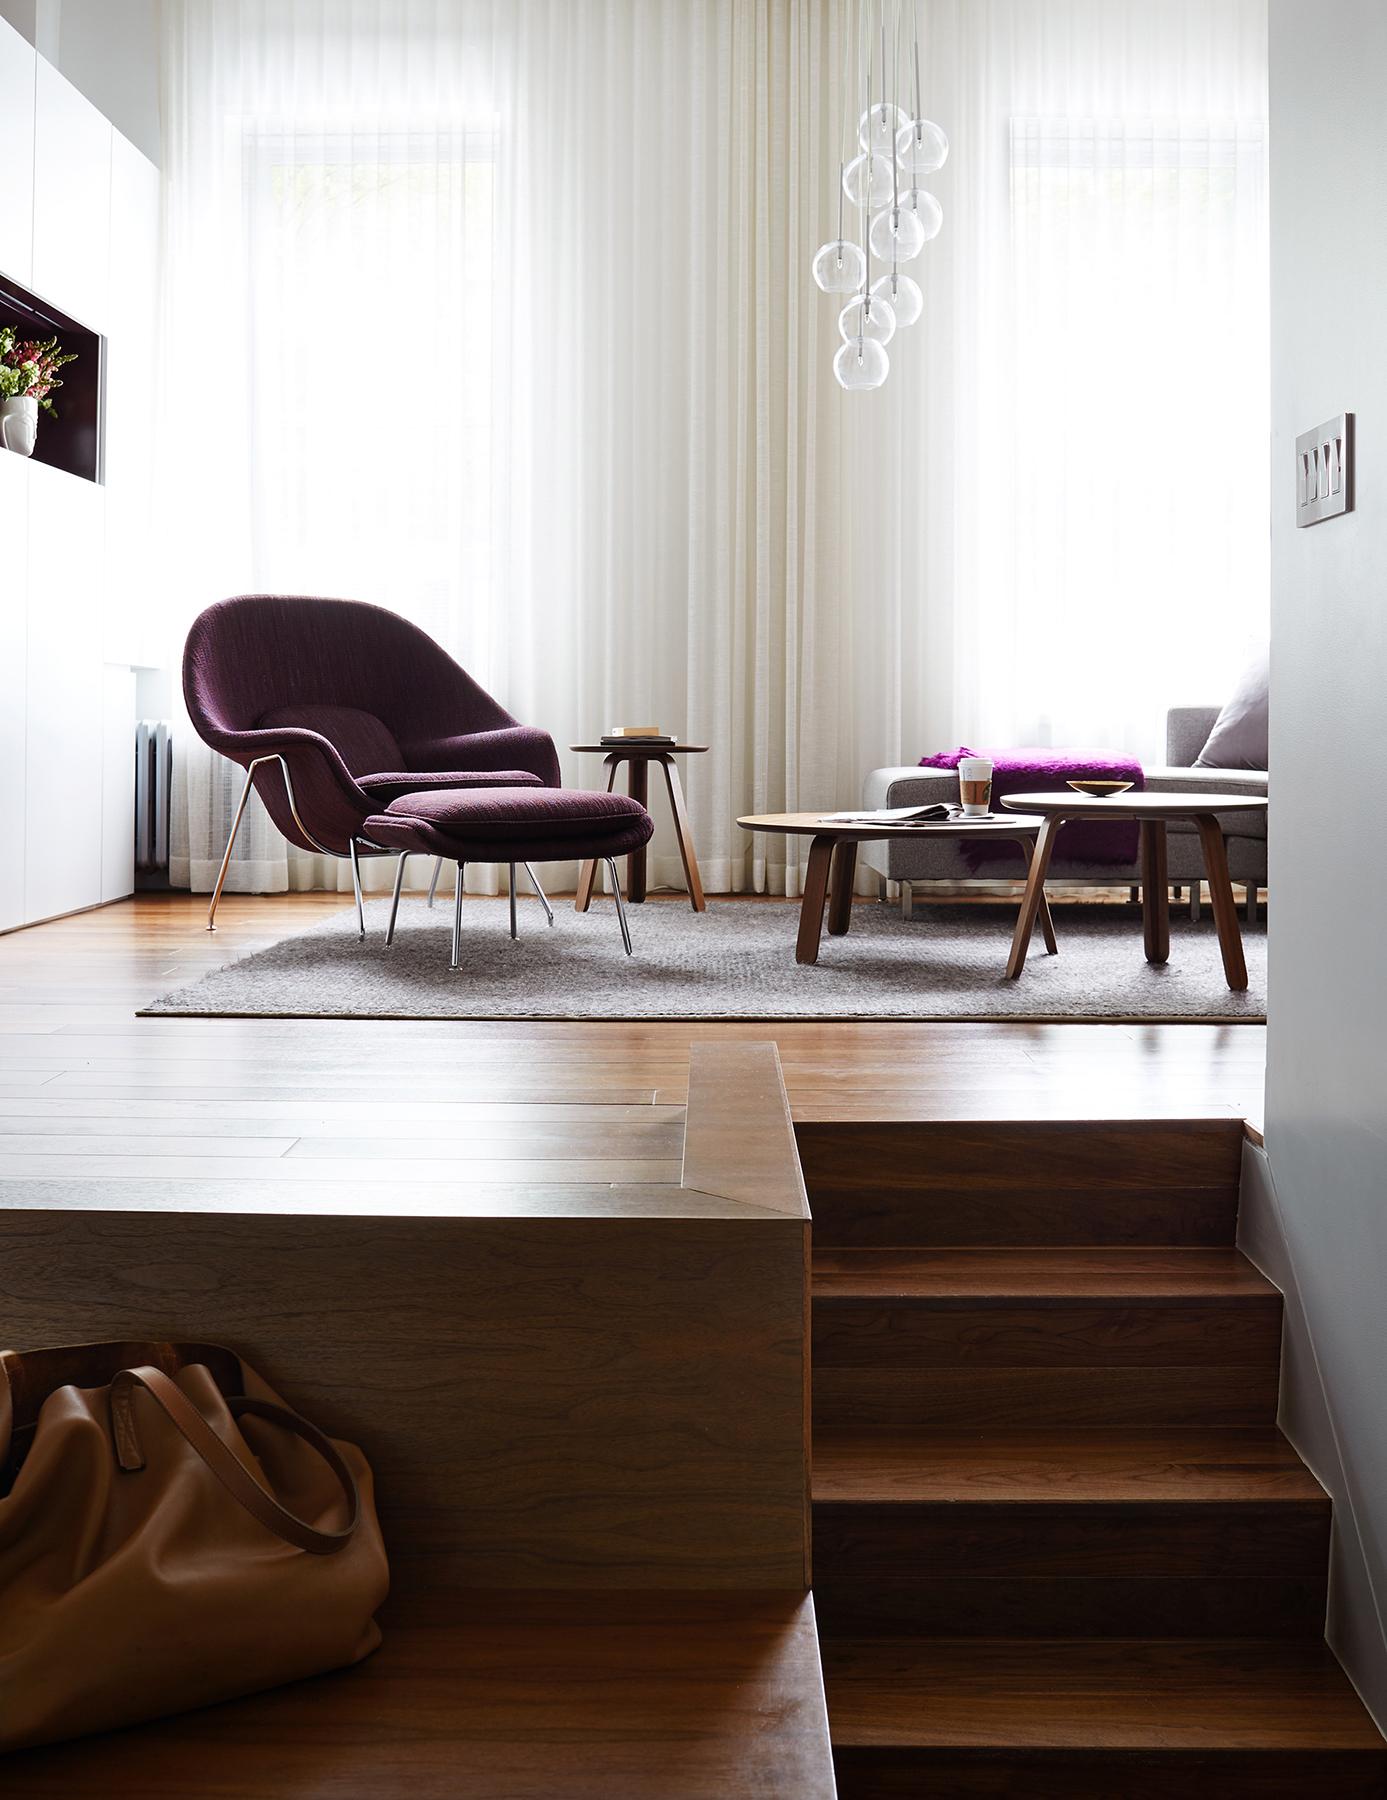 STADT, STADT Architecture, New York City Architect, nyc architects, ny apartment renovation